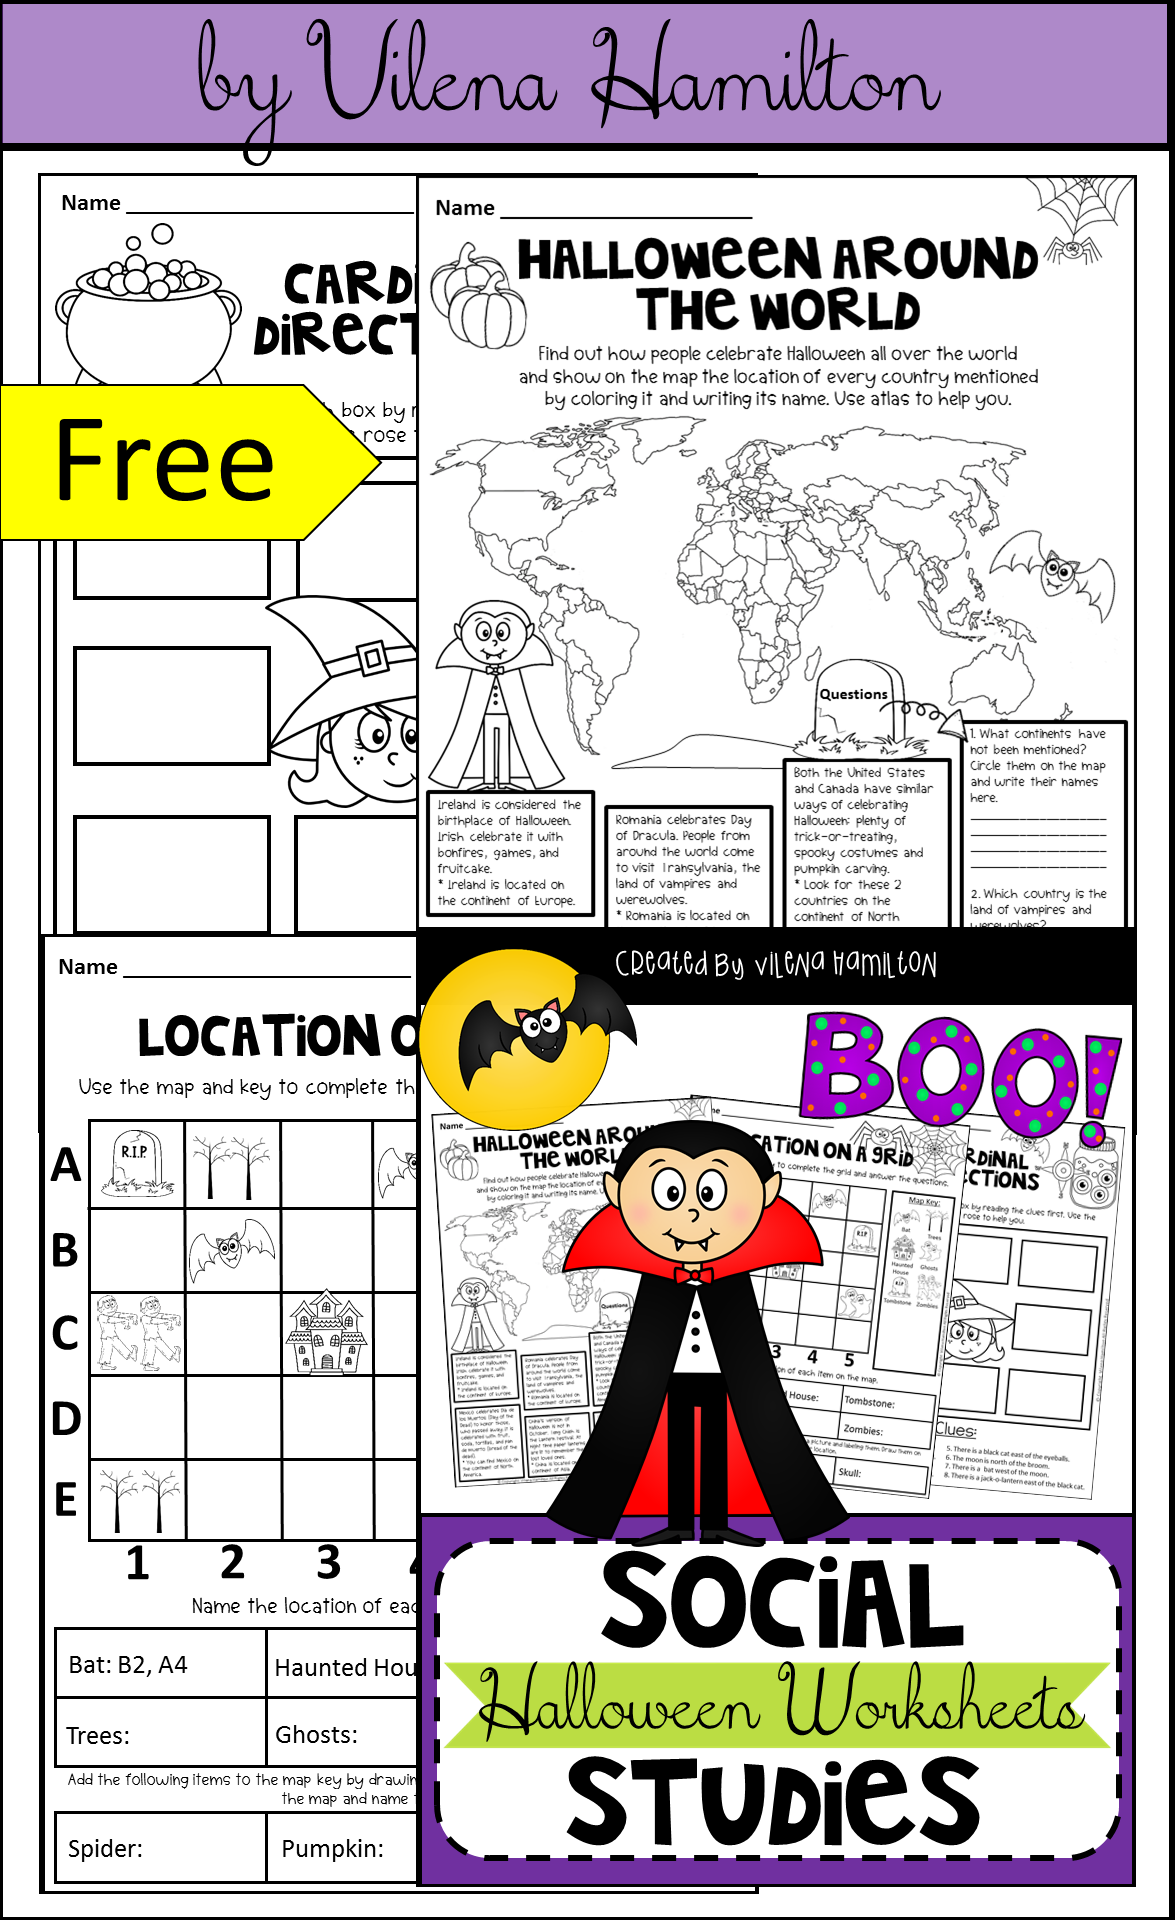 Grades 1-3 Print & Go Worksheets   Social Studies Worksheets